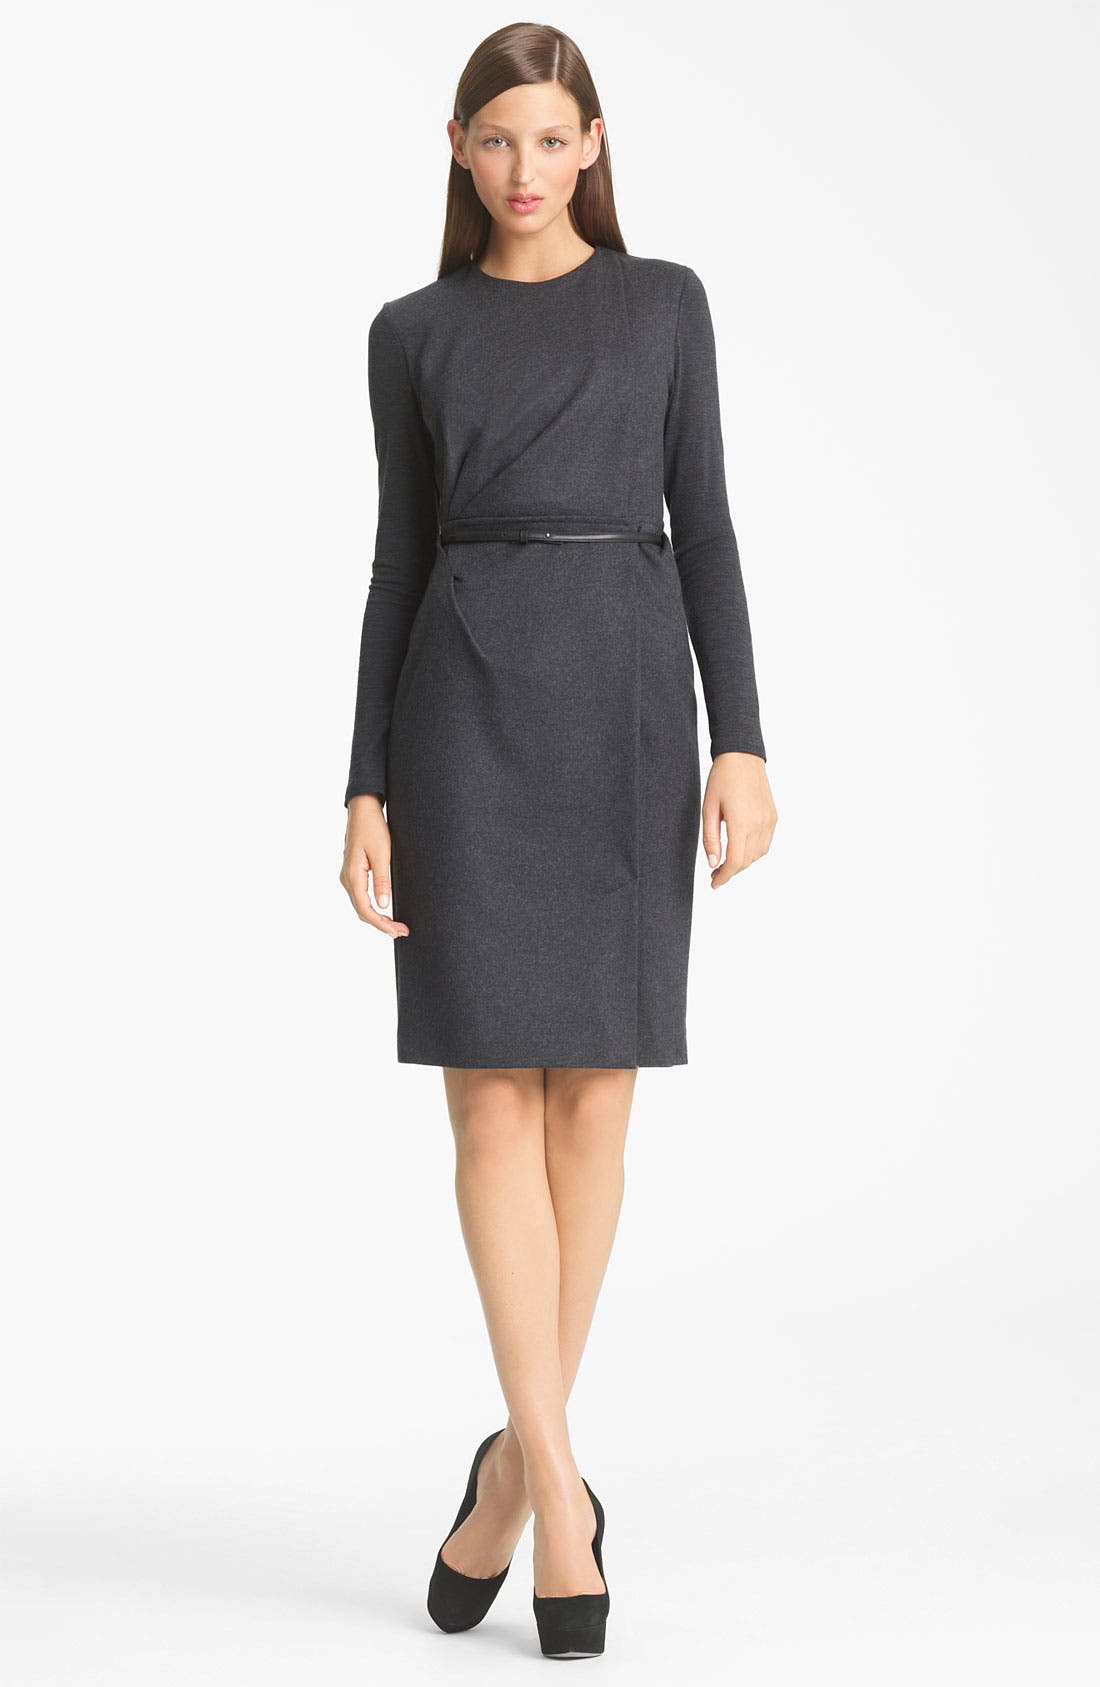 Alternate Image 1 Selected - Max Mara 'Santos' Belted Wool Jersey Dress